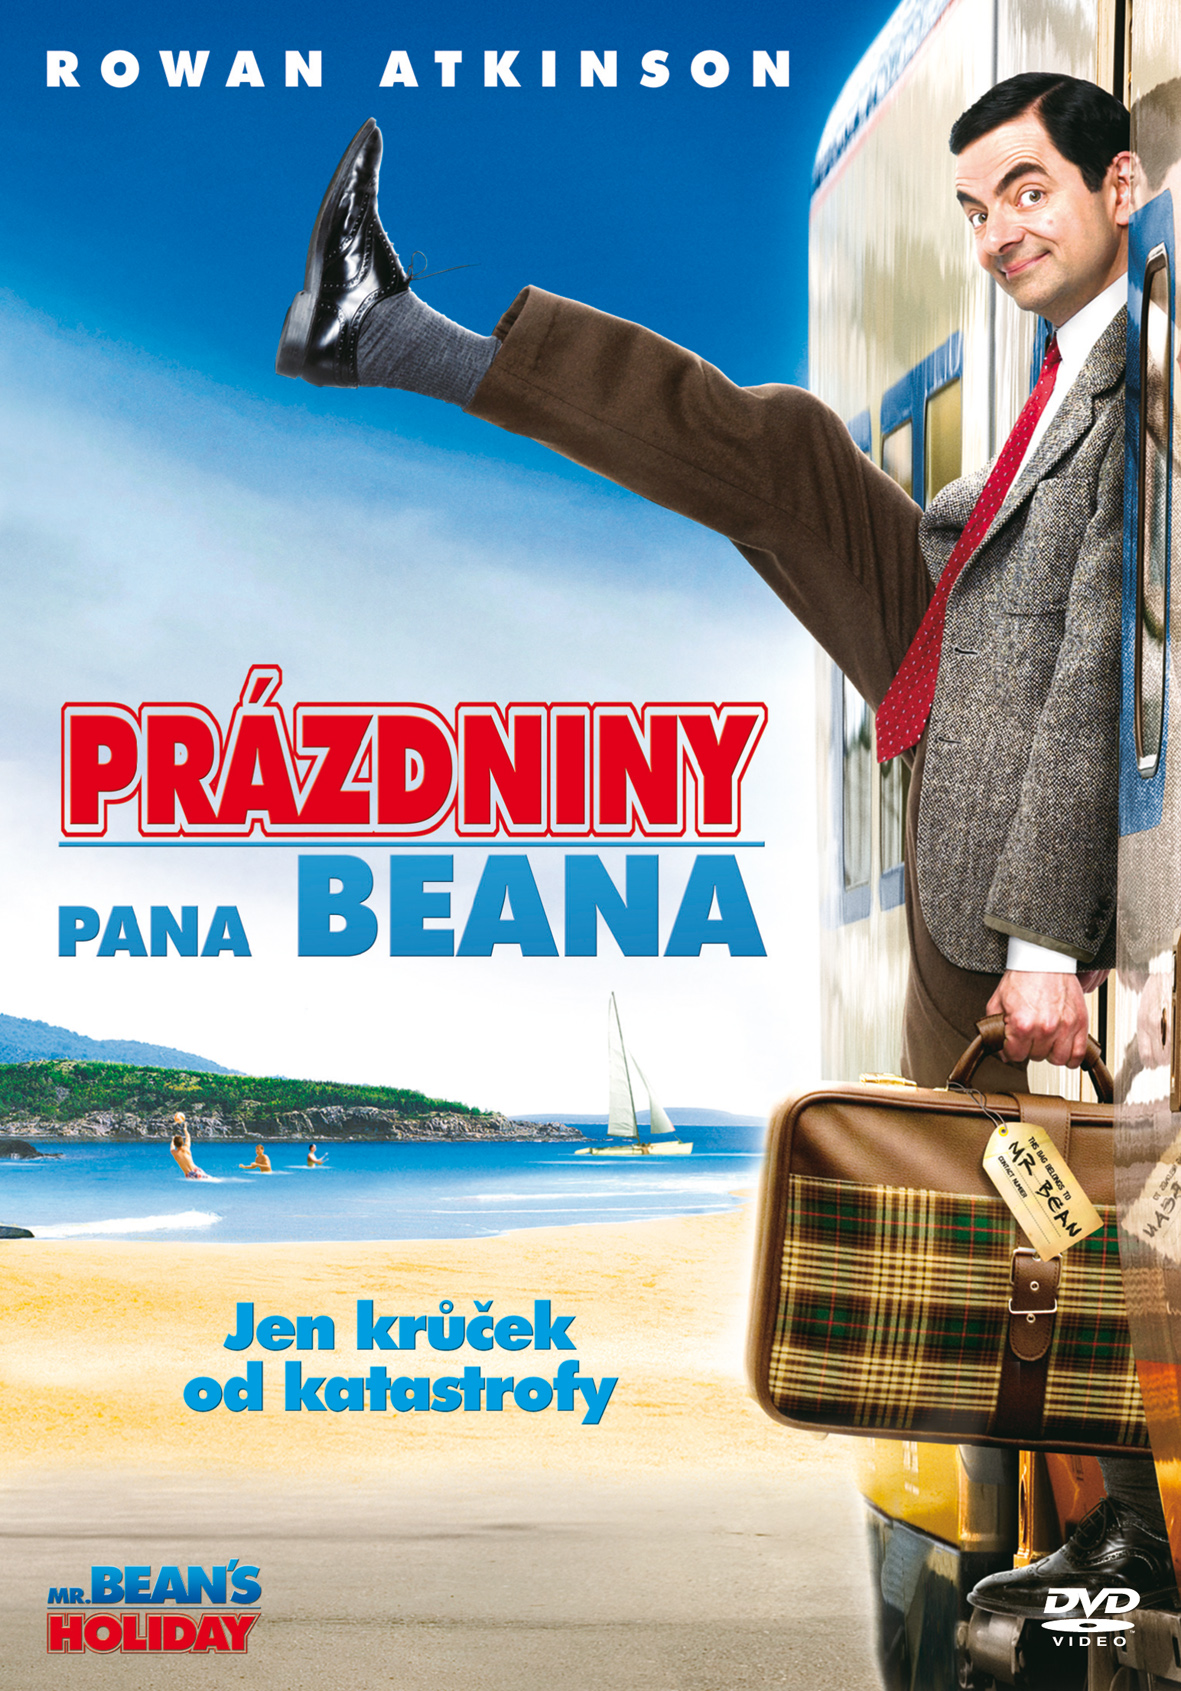 Film Prázdniny pana Beana online zdarma